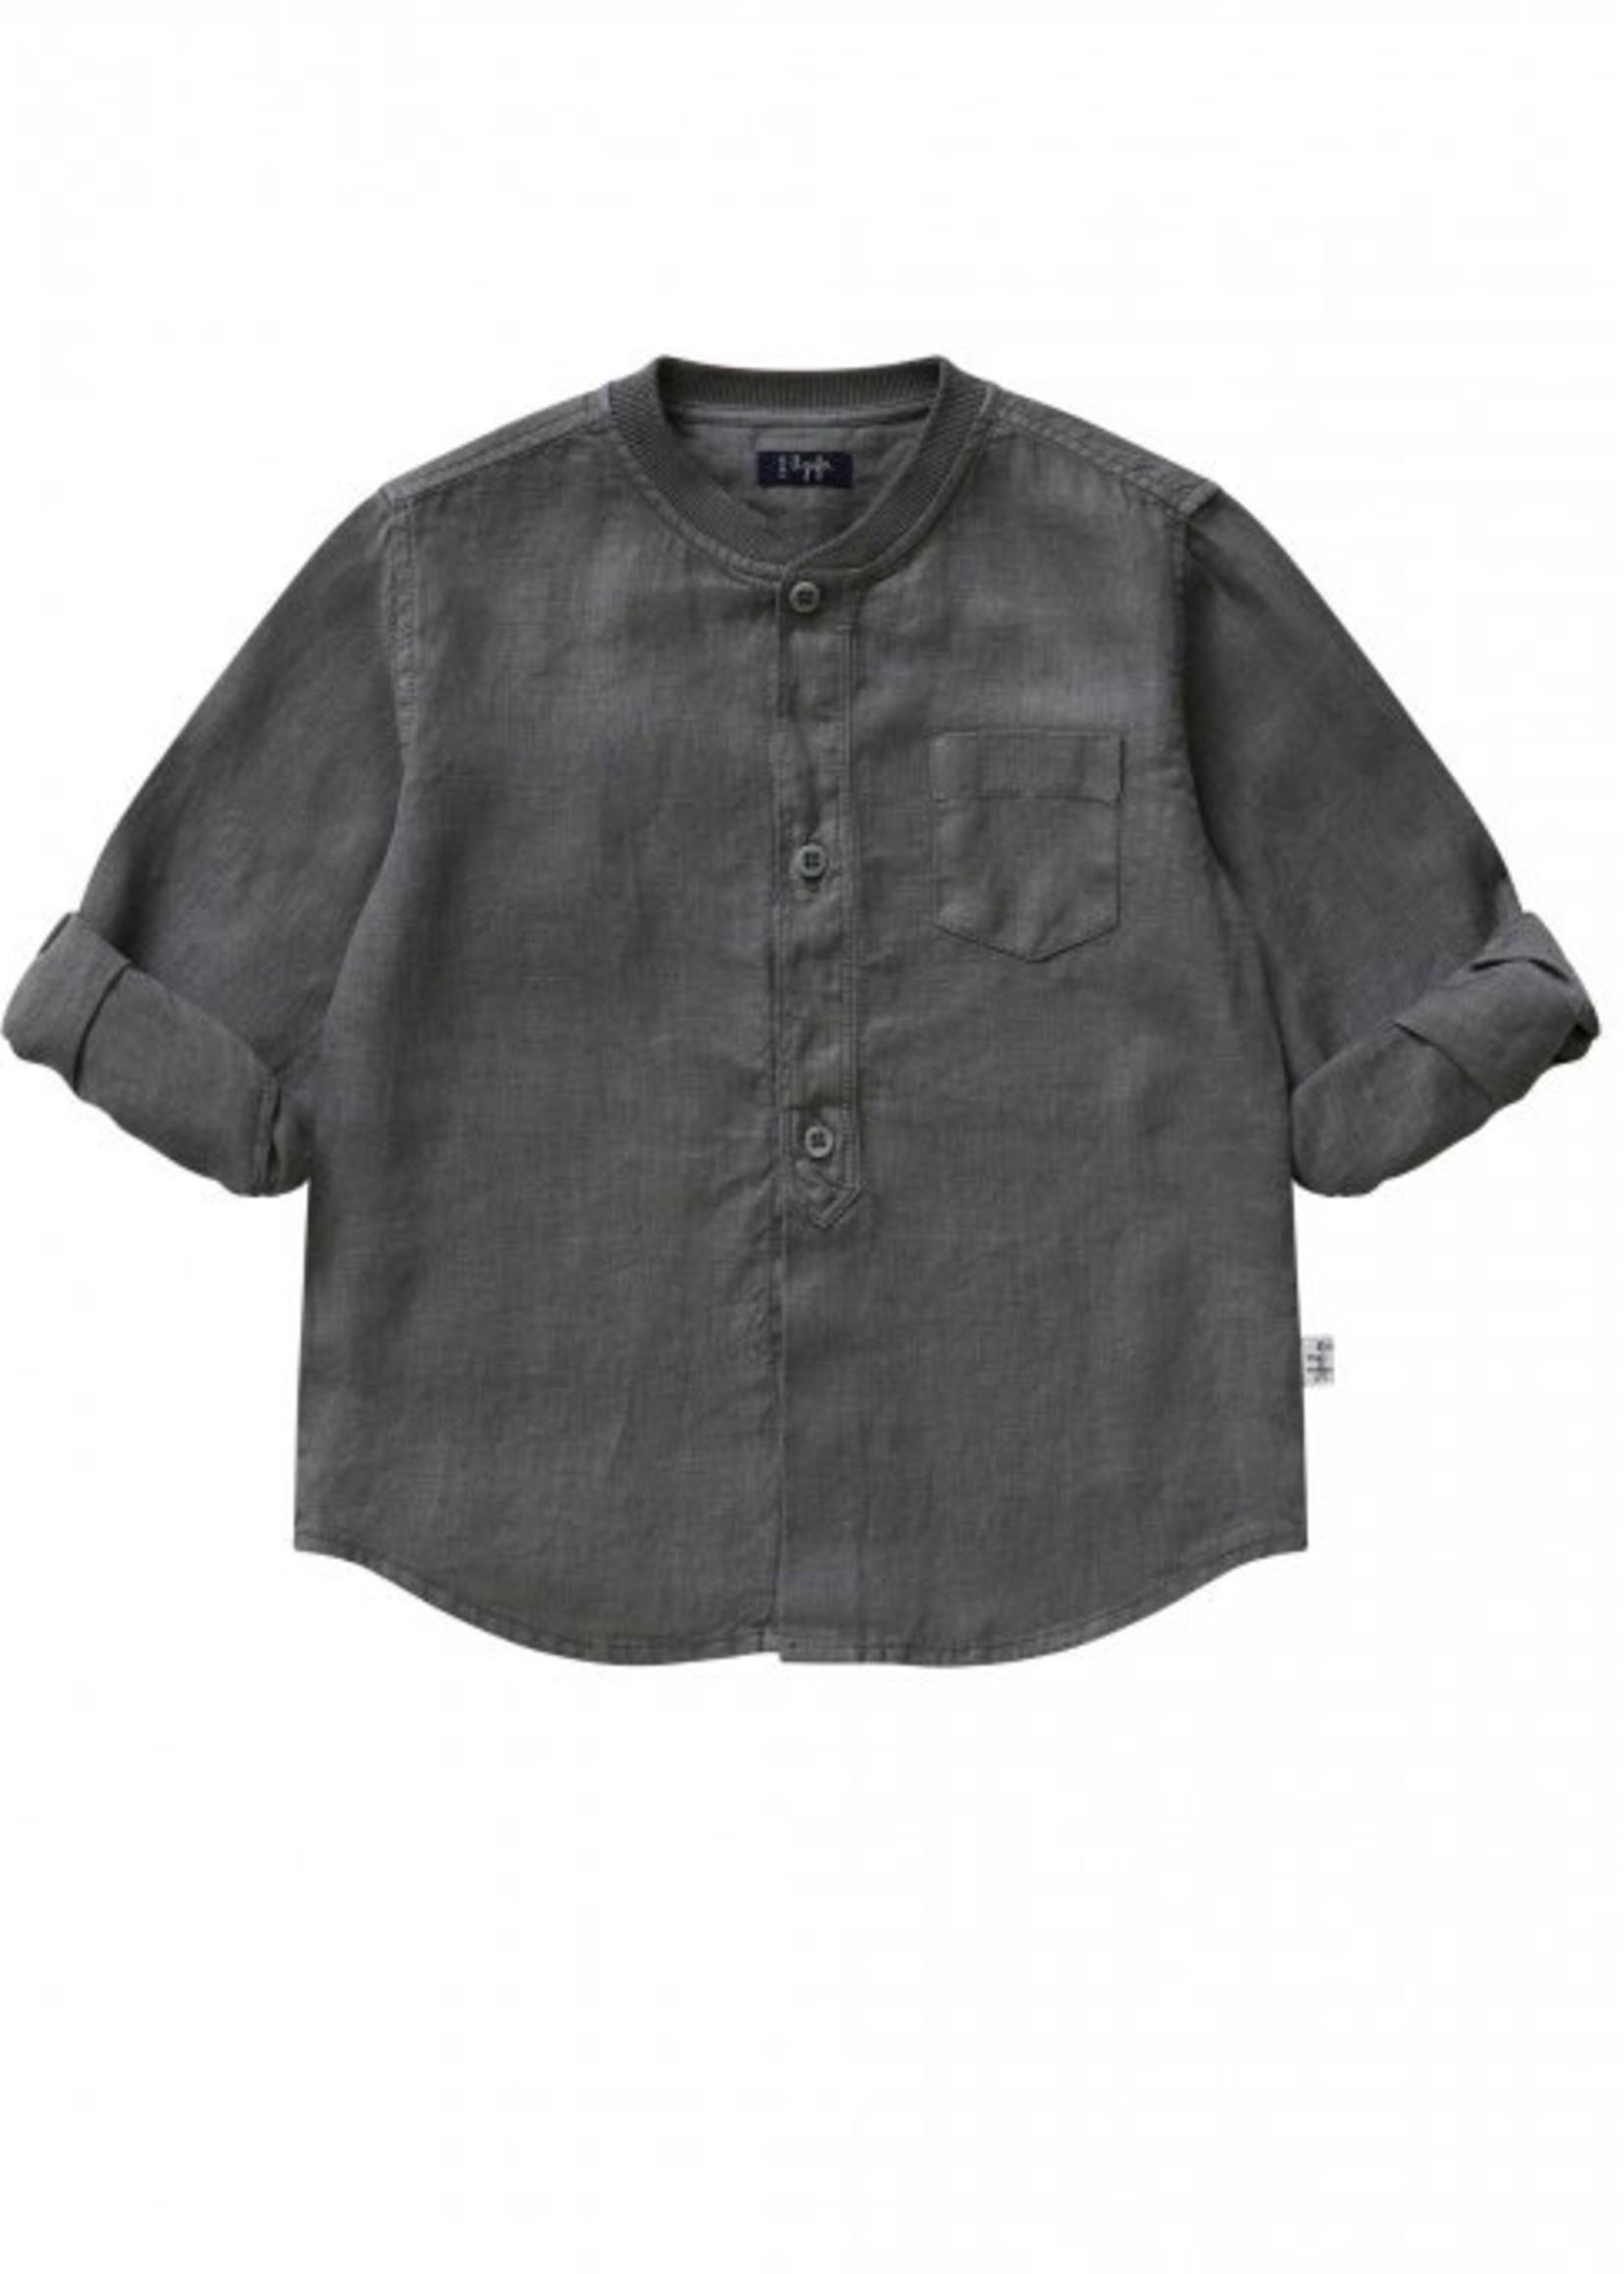 Il Gufo Ilgufo Boys Shirt